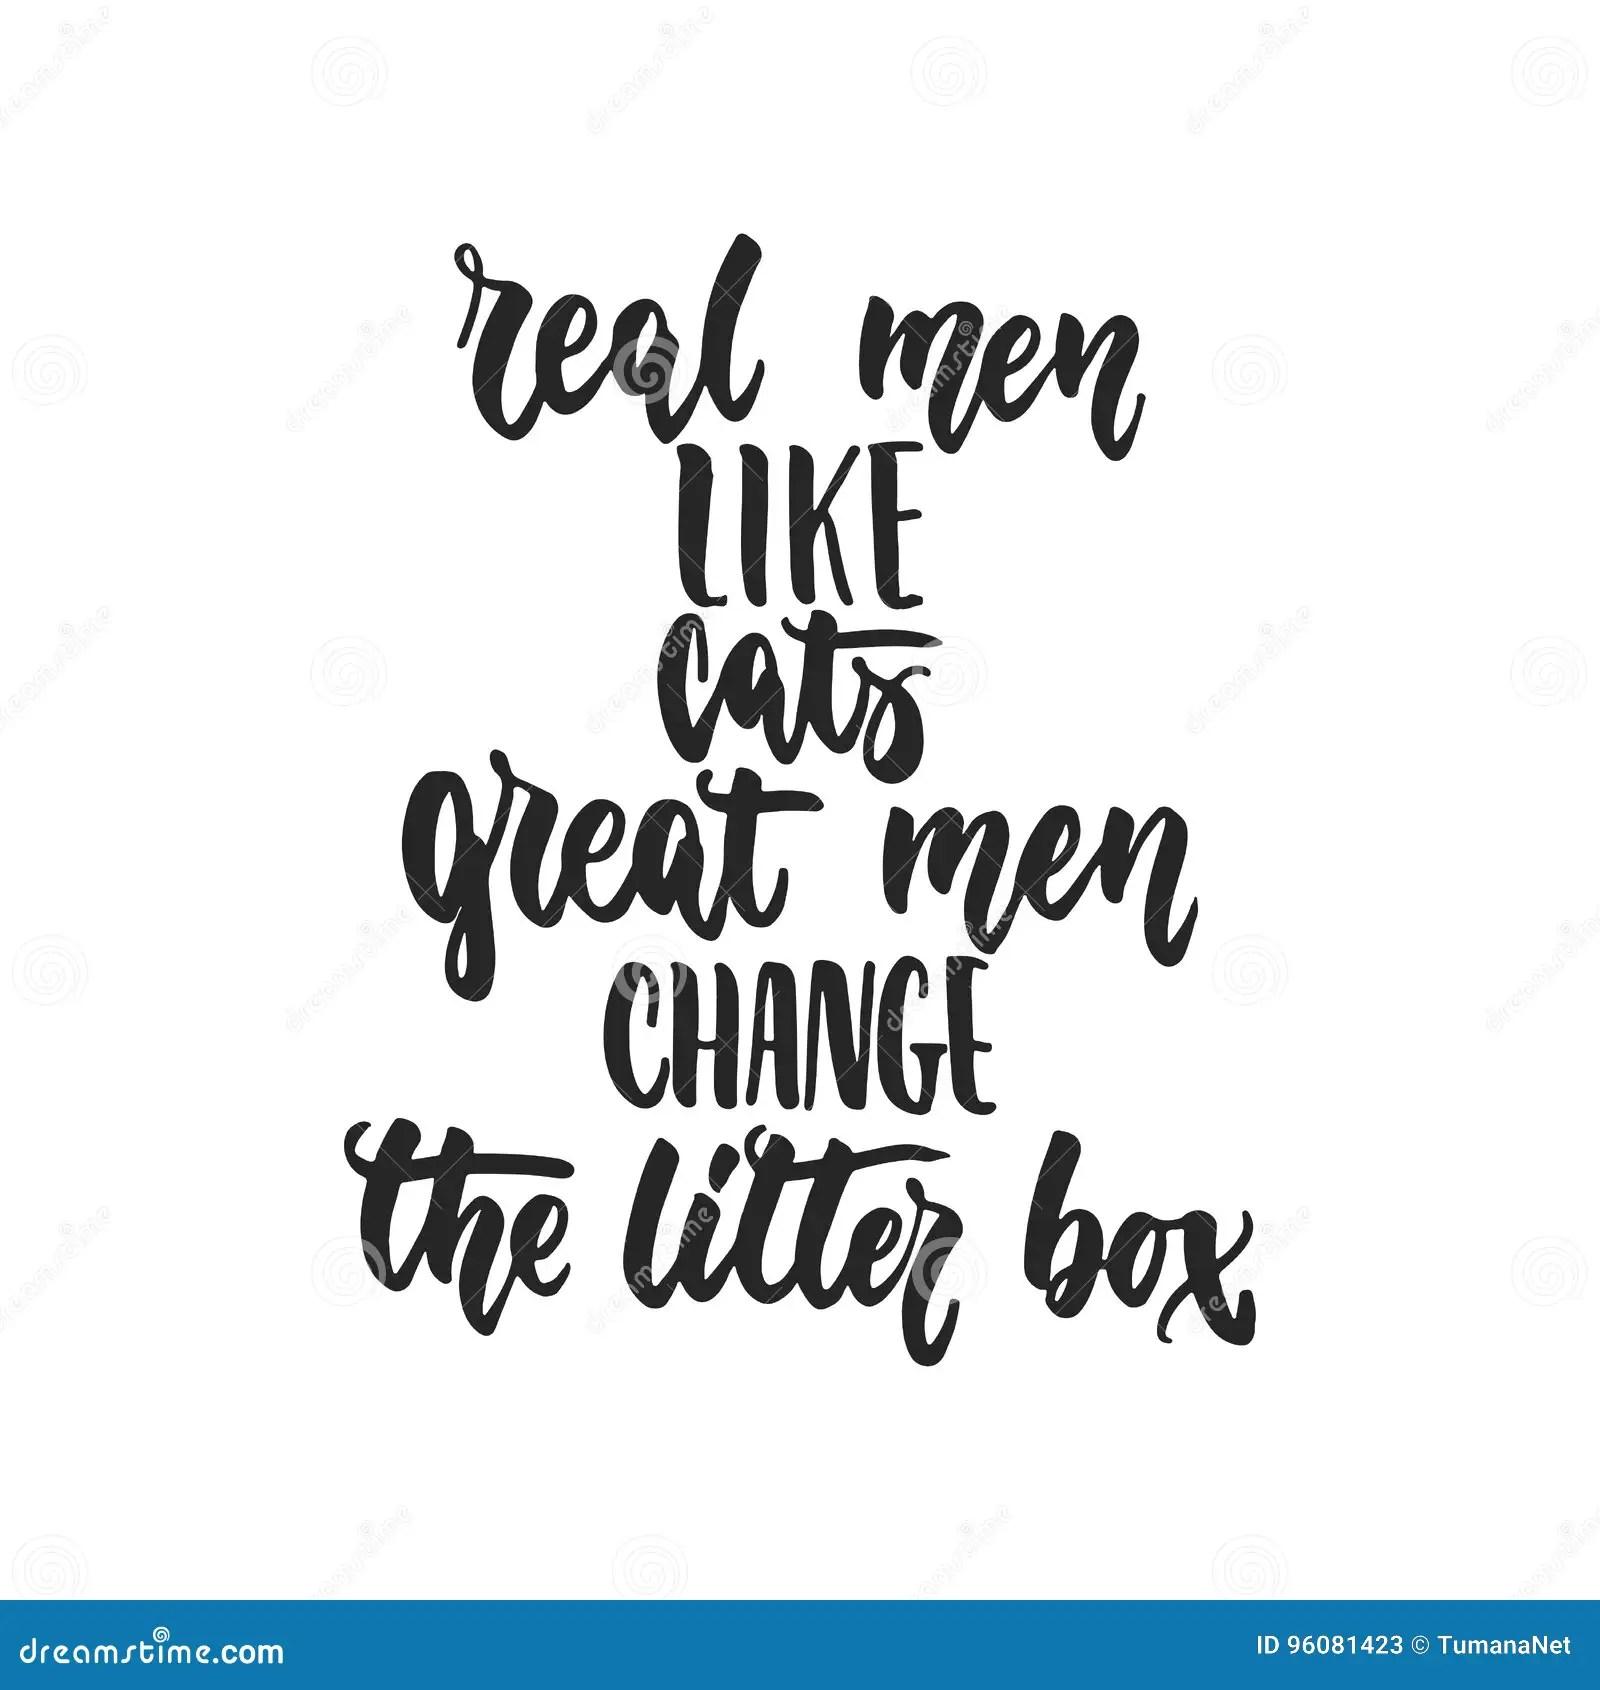 Real Men Like Cats Great Men Change The Litter Box